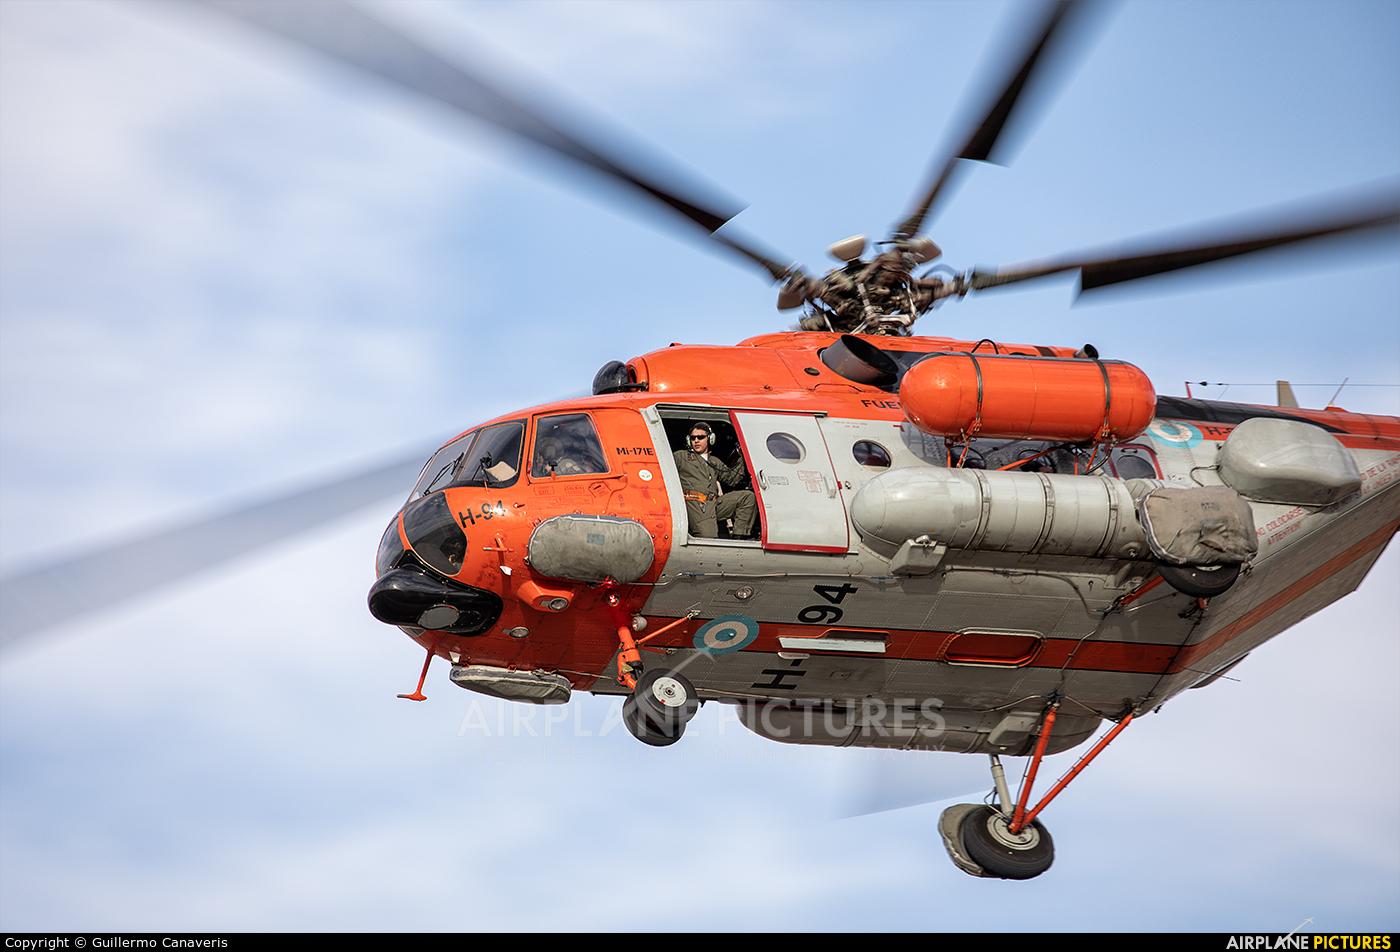 Argentina - Air Force H-94 aircraft at Rio Cuarto - Area de Material